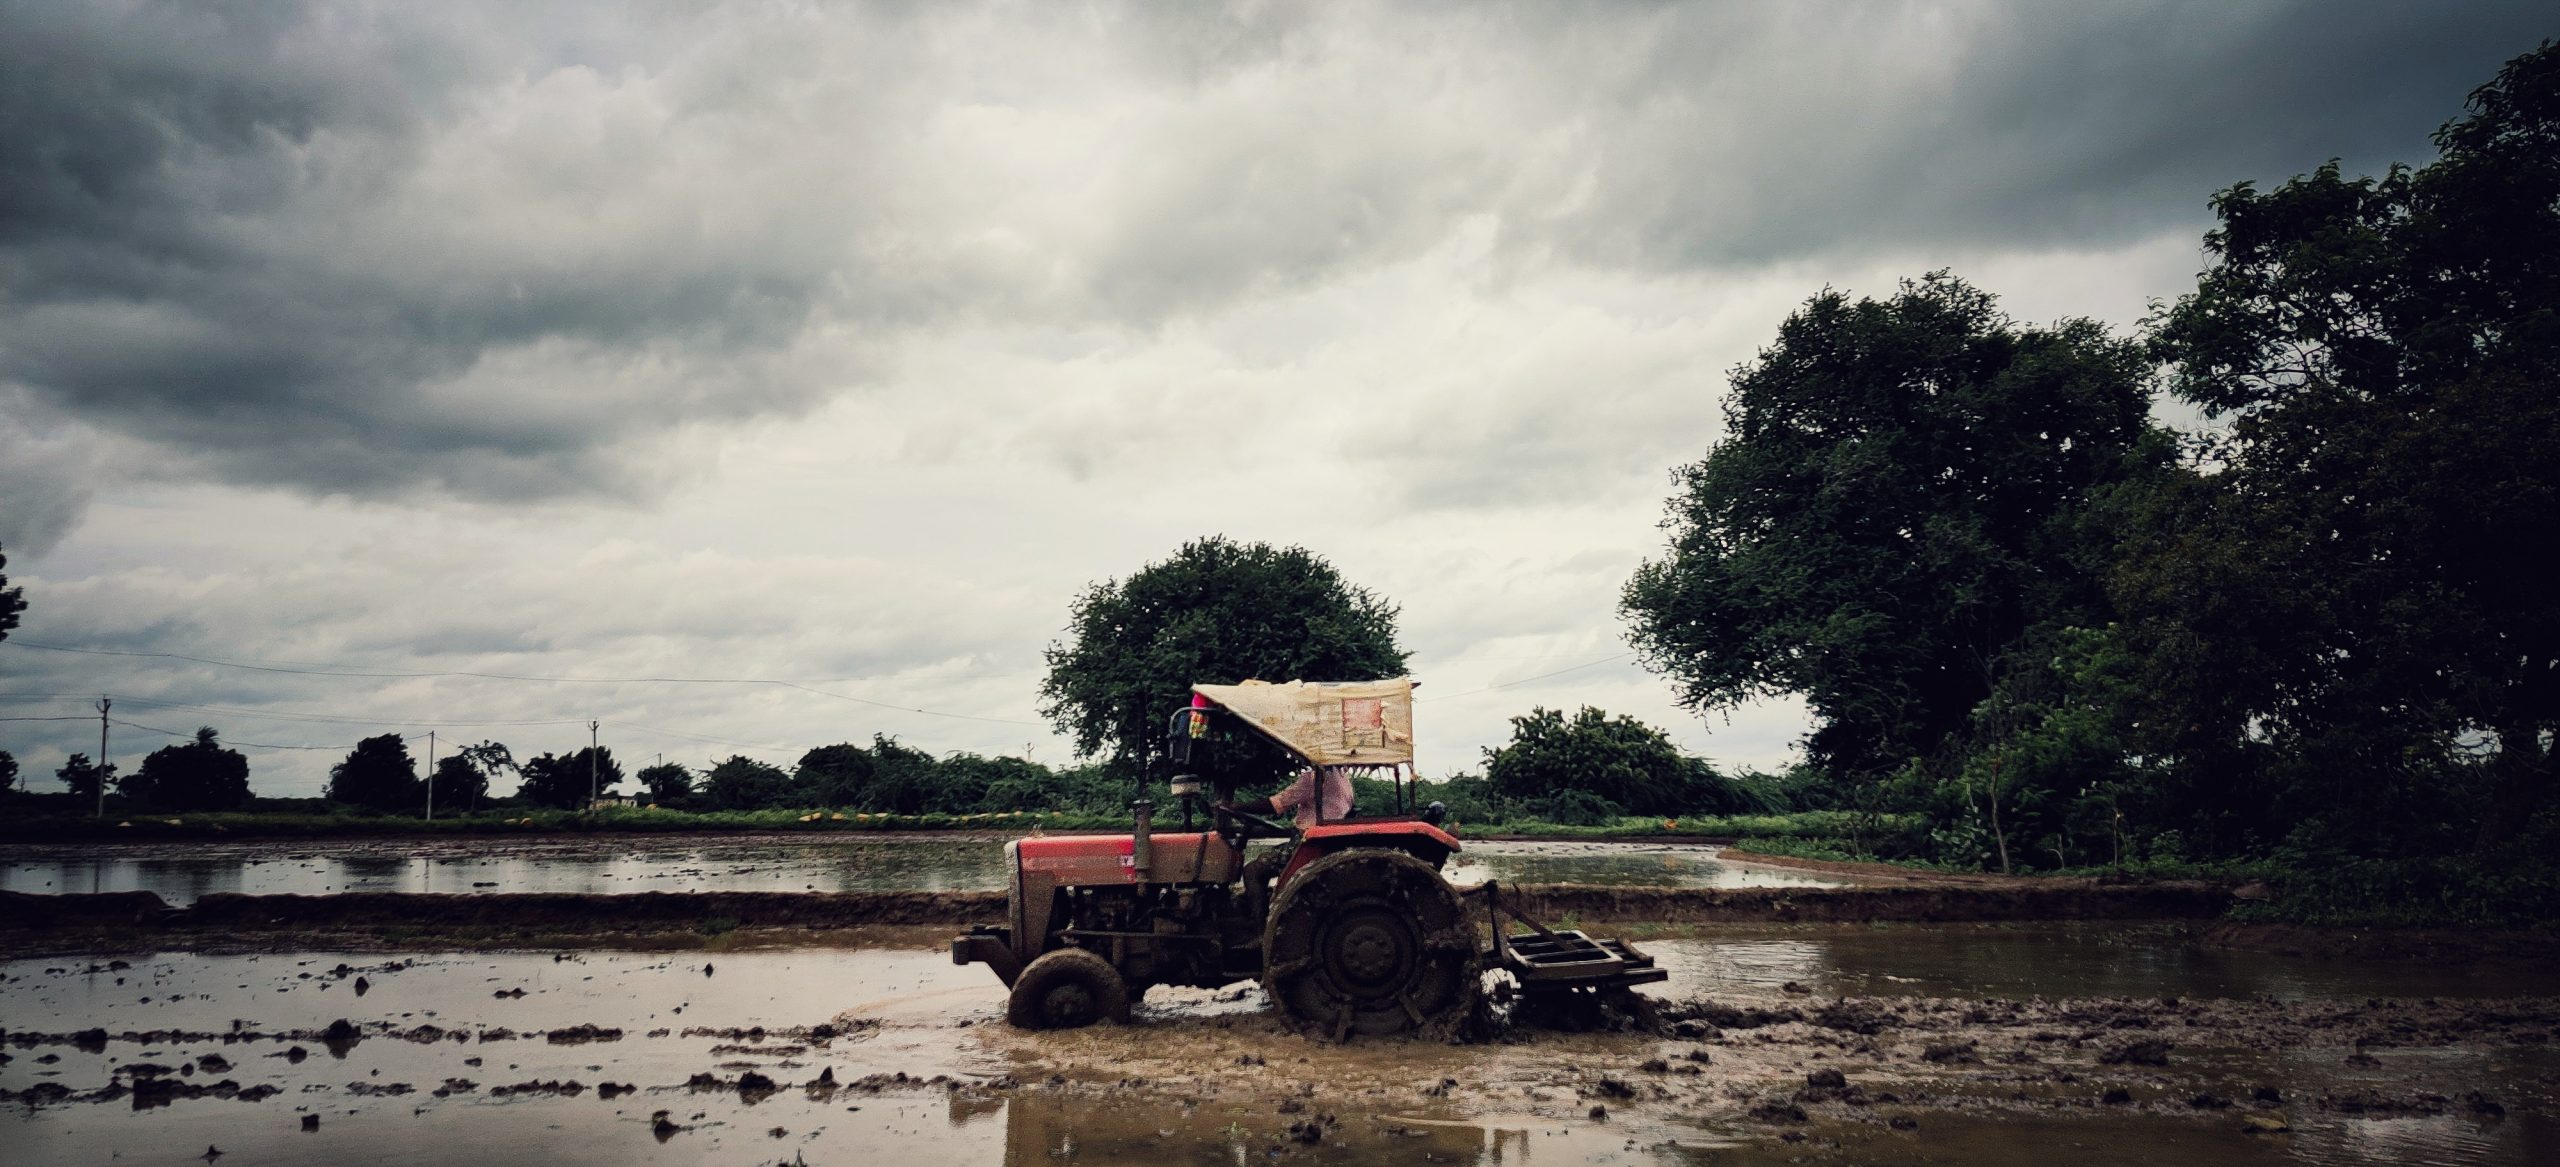 A farming tractor in a field